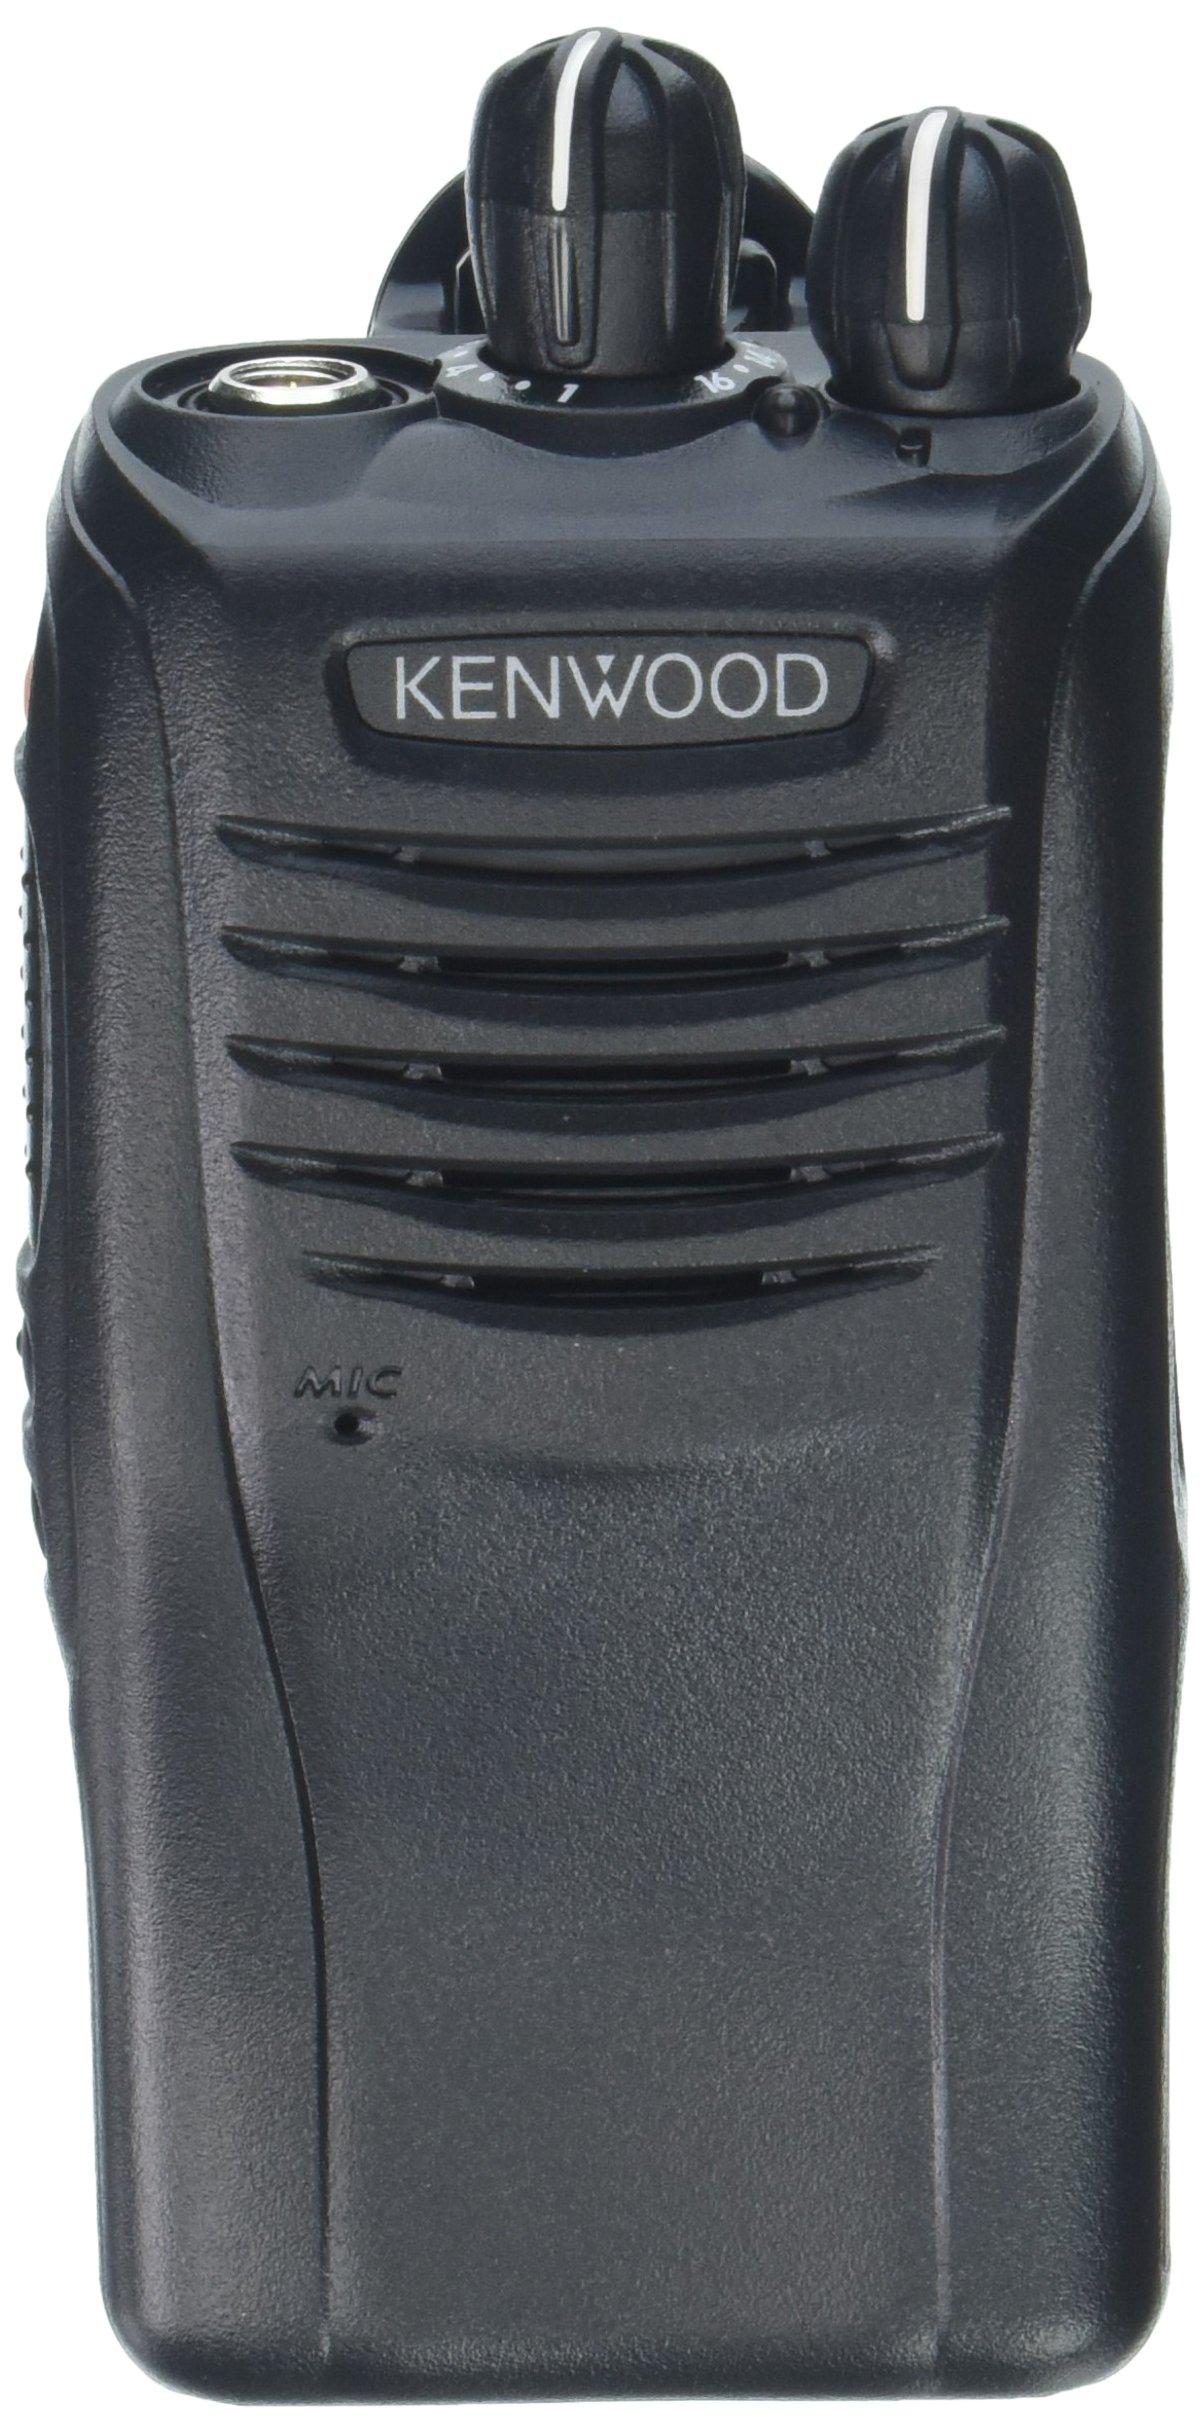 Kenwood TK-3360ISU16P Intrinsically Safe UHF 5 Watt Business Radio, Black